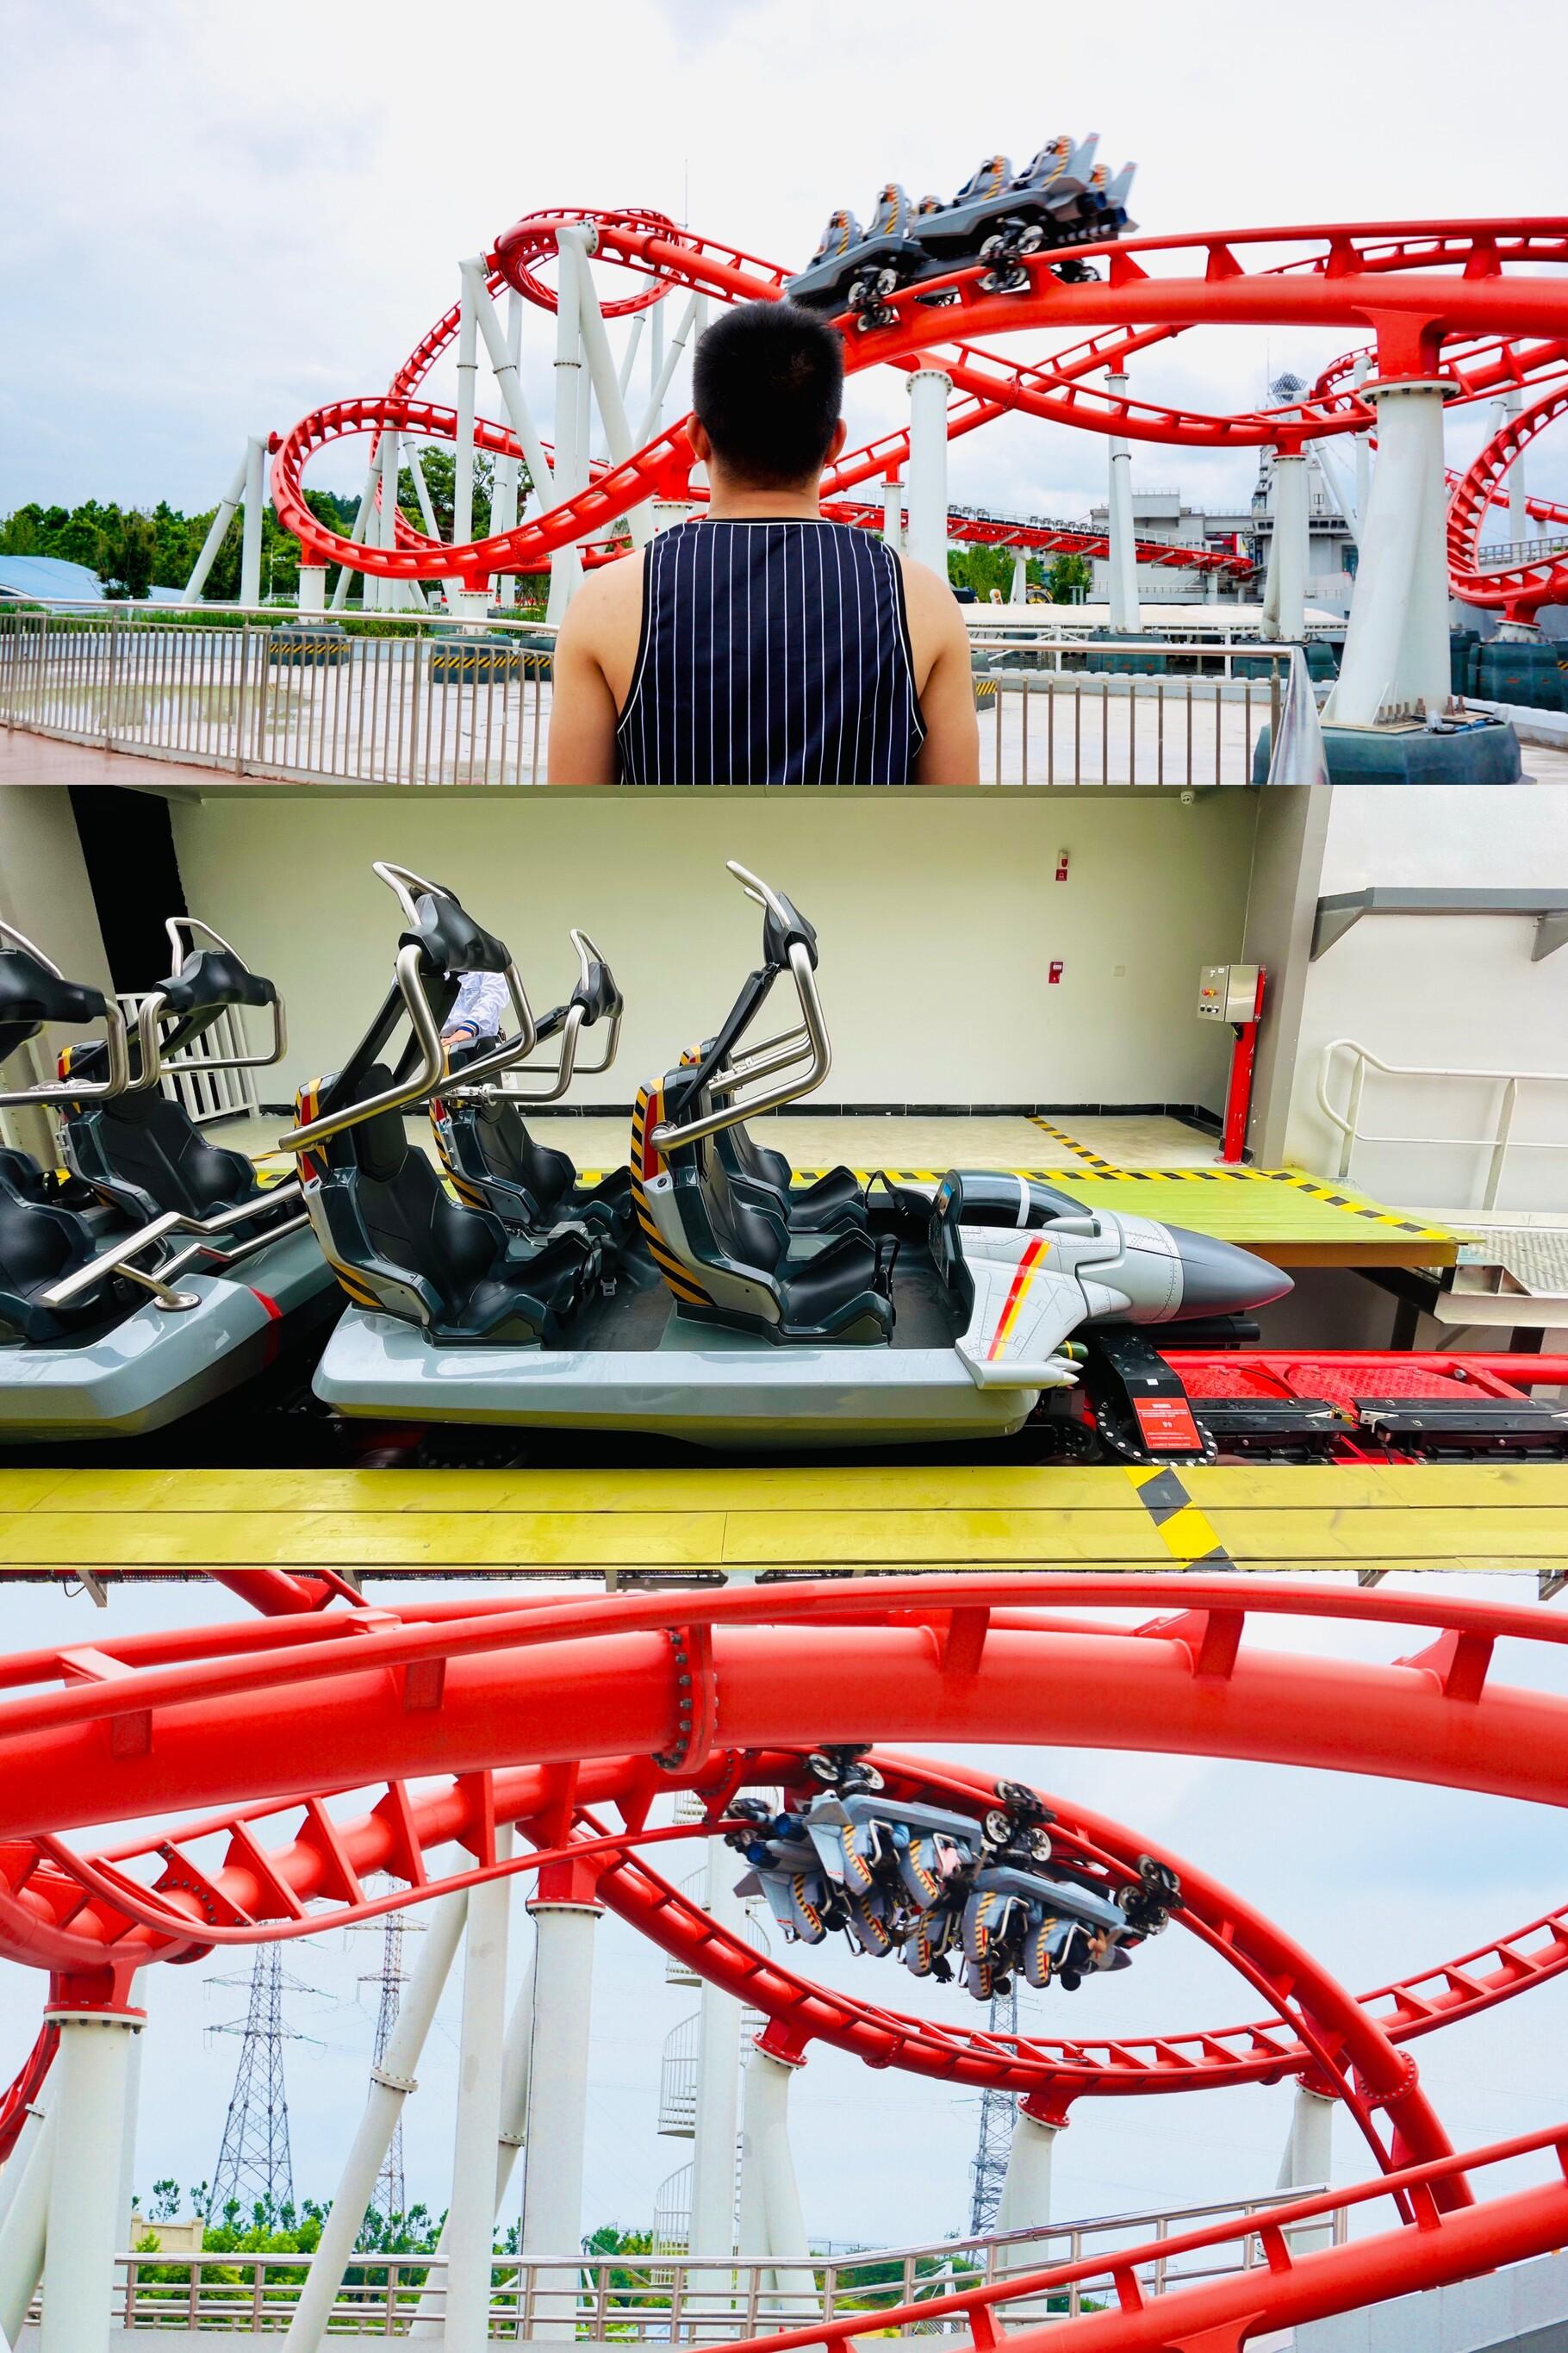 fantawild-theme-parks-81916100.jpg